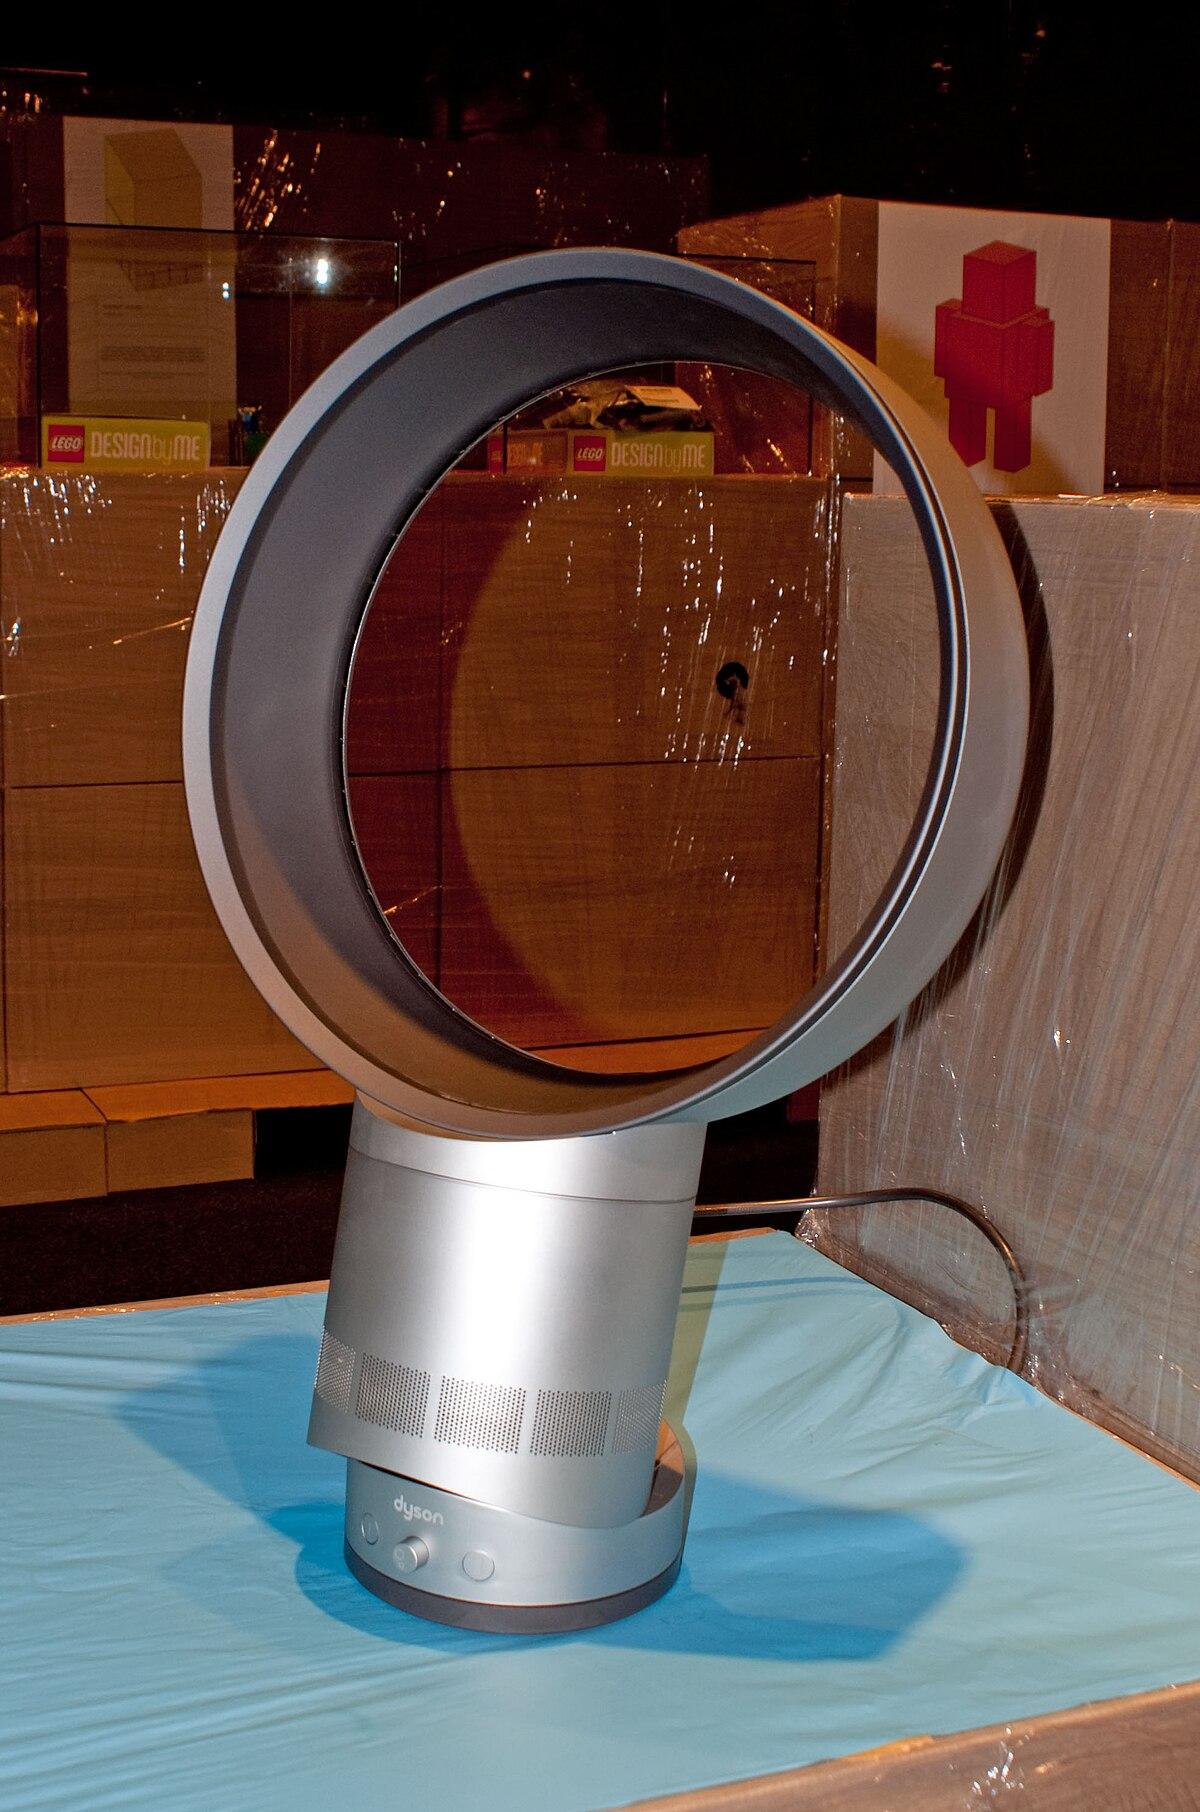 Ventilatore senza pale wikipedia for Ventilatore a pale